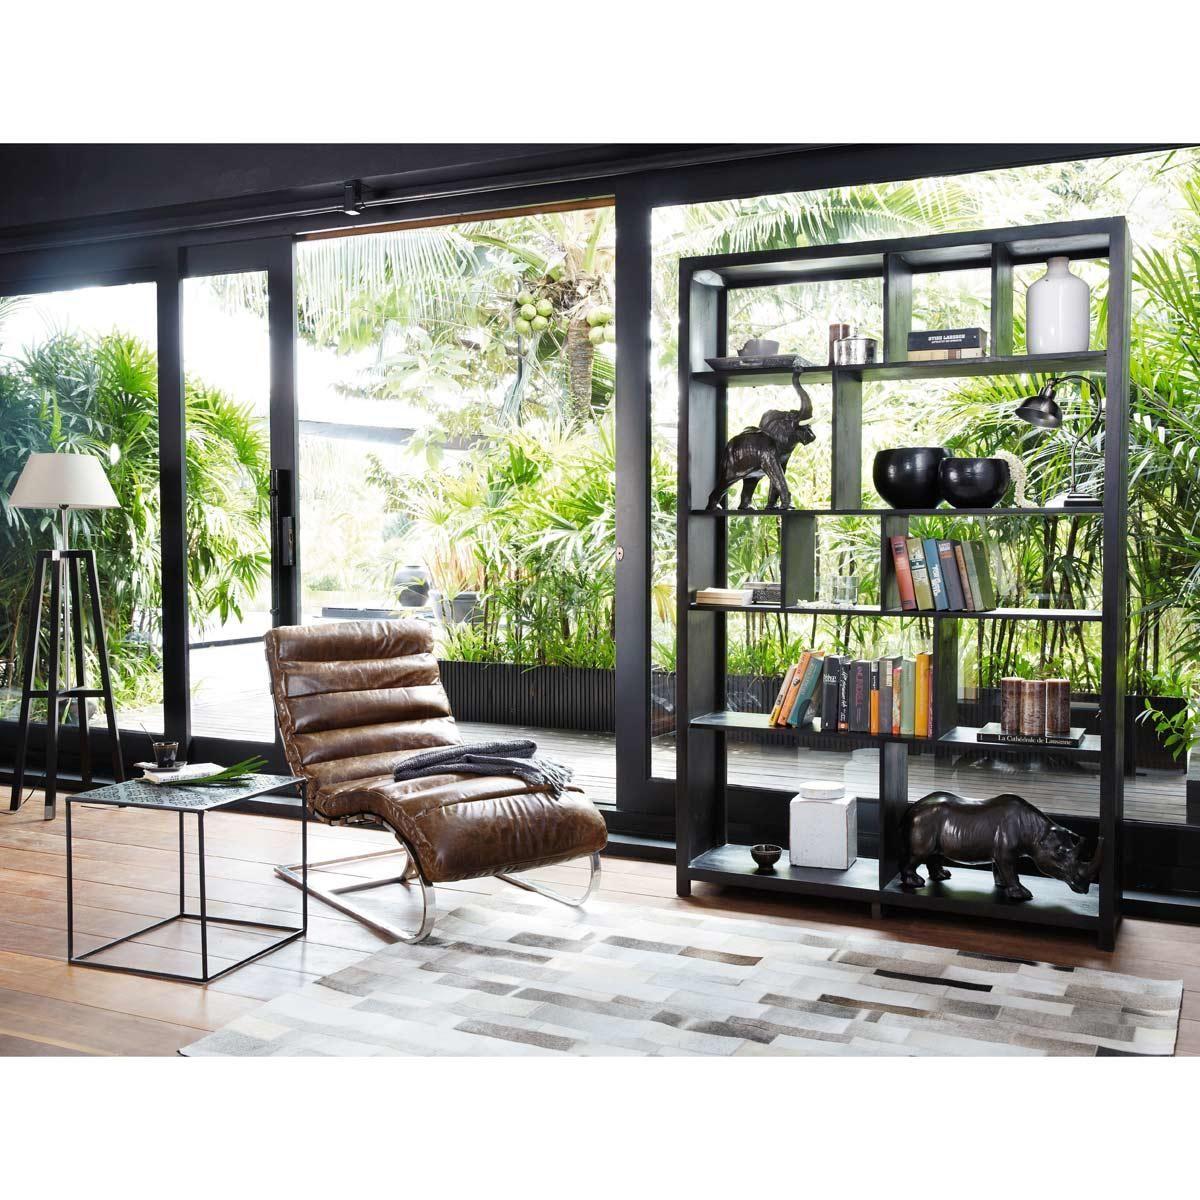 tapis en cuir 160x230 exotique pinterest. Black Bedroom Furniture Sets. Home Design Ideas